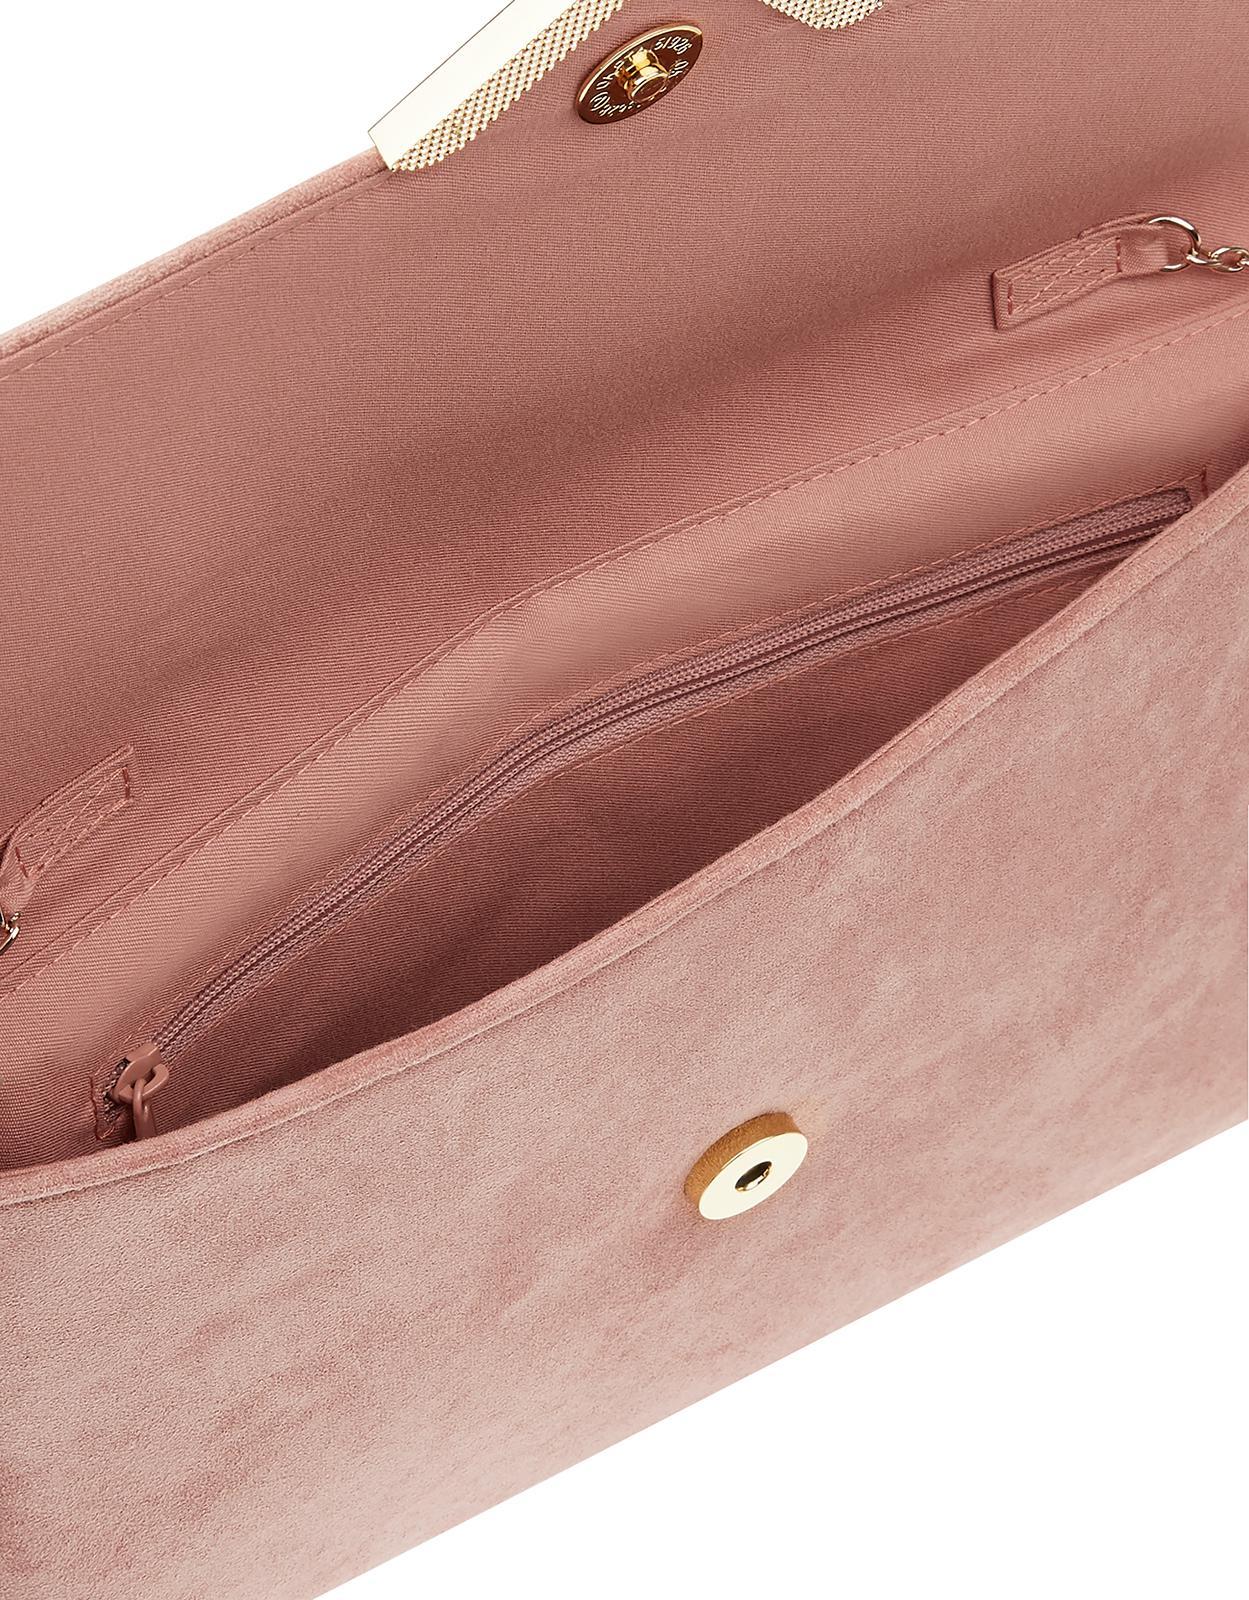 fc622d0b8 Accessorize - Pink Natalie Suedette Envelope Clutch Bag - Lyst. View  fullscreen